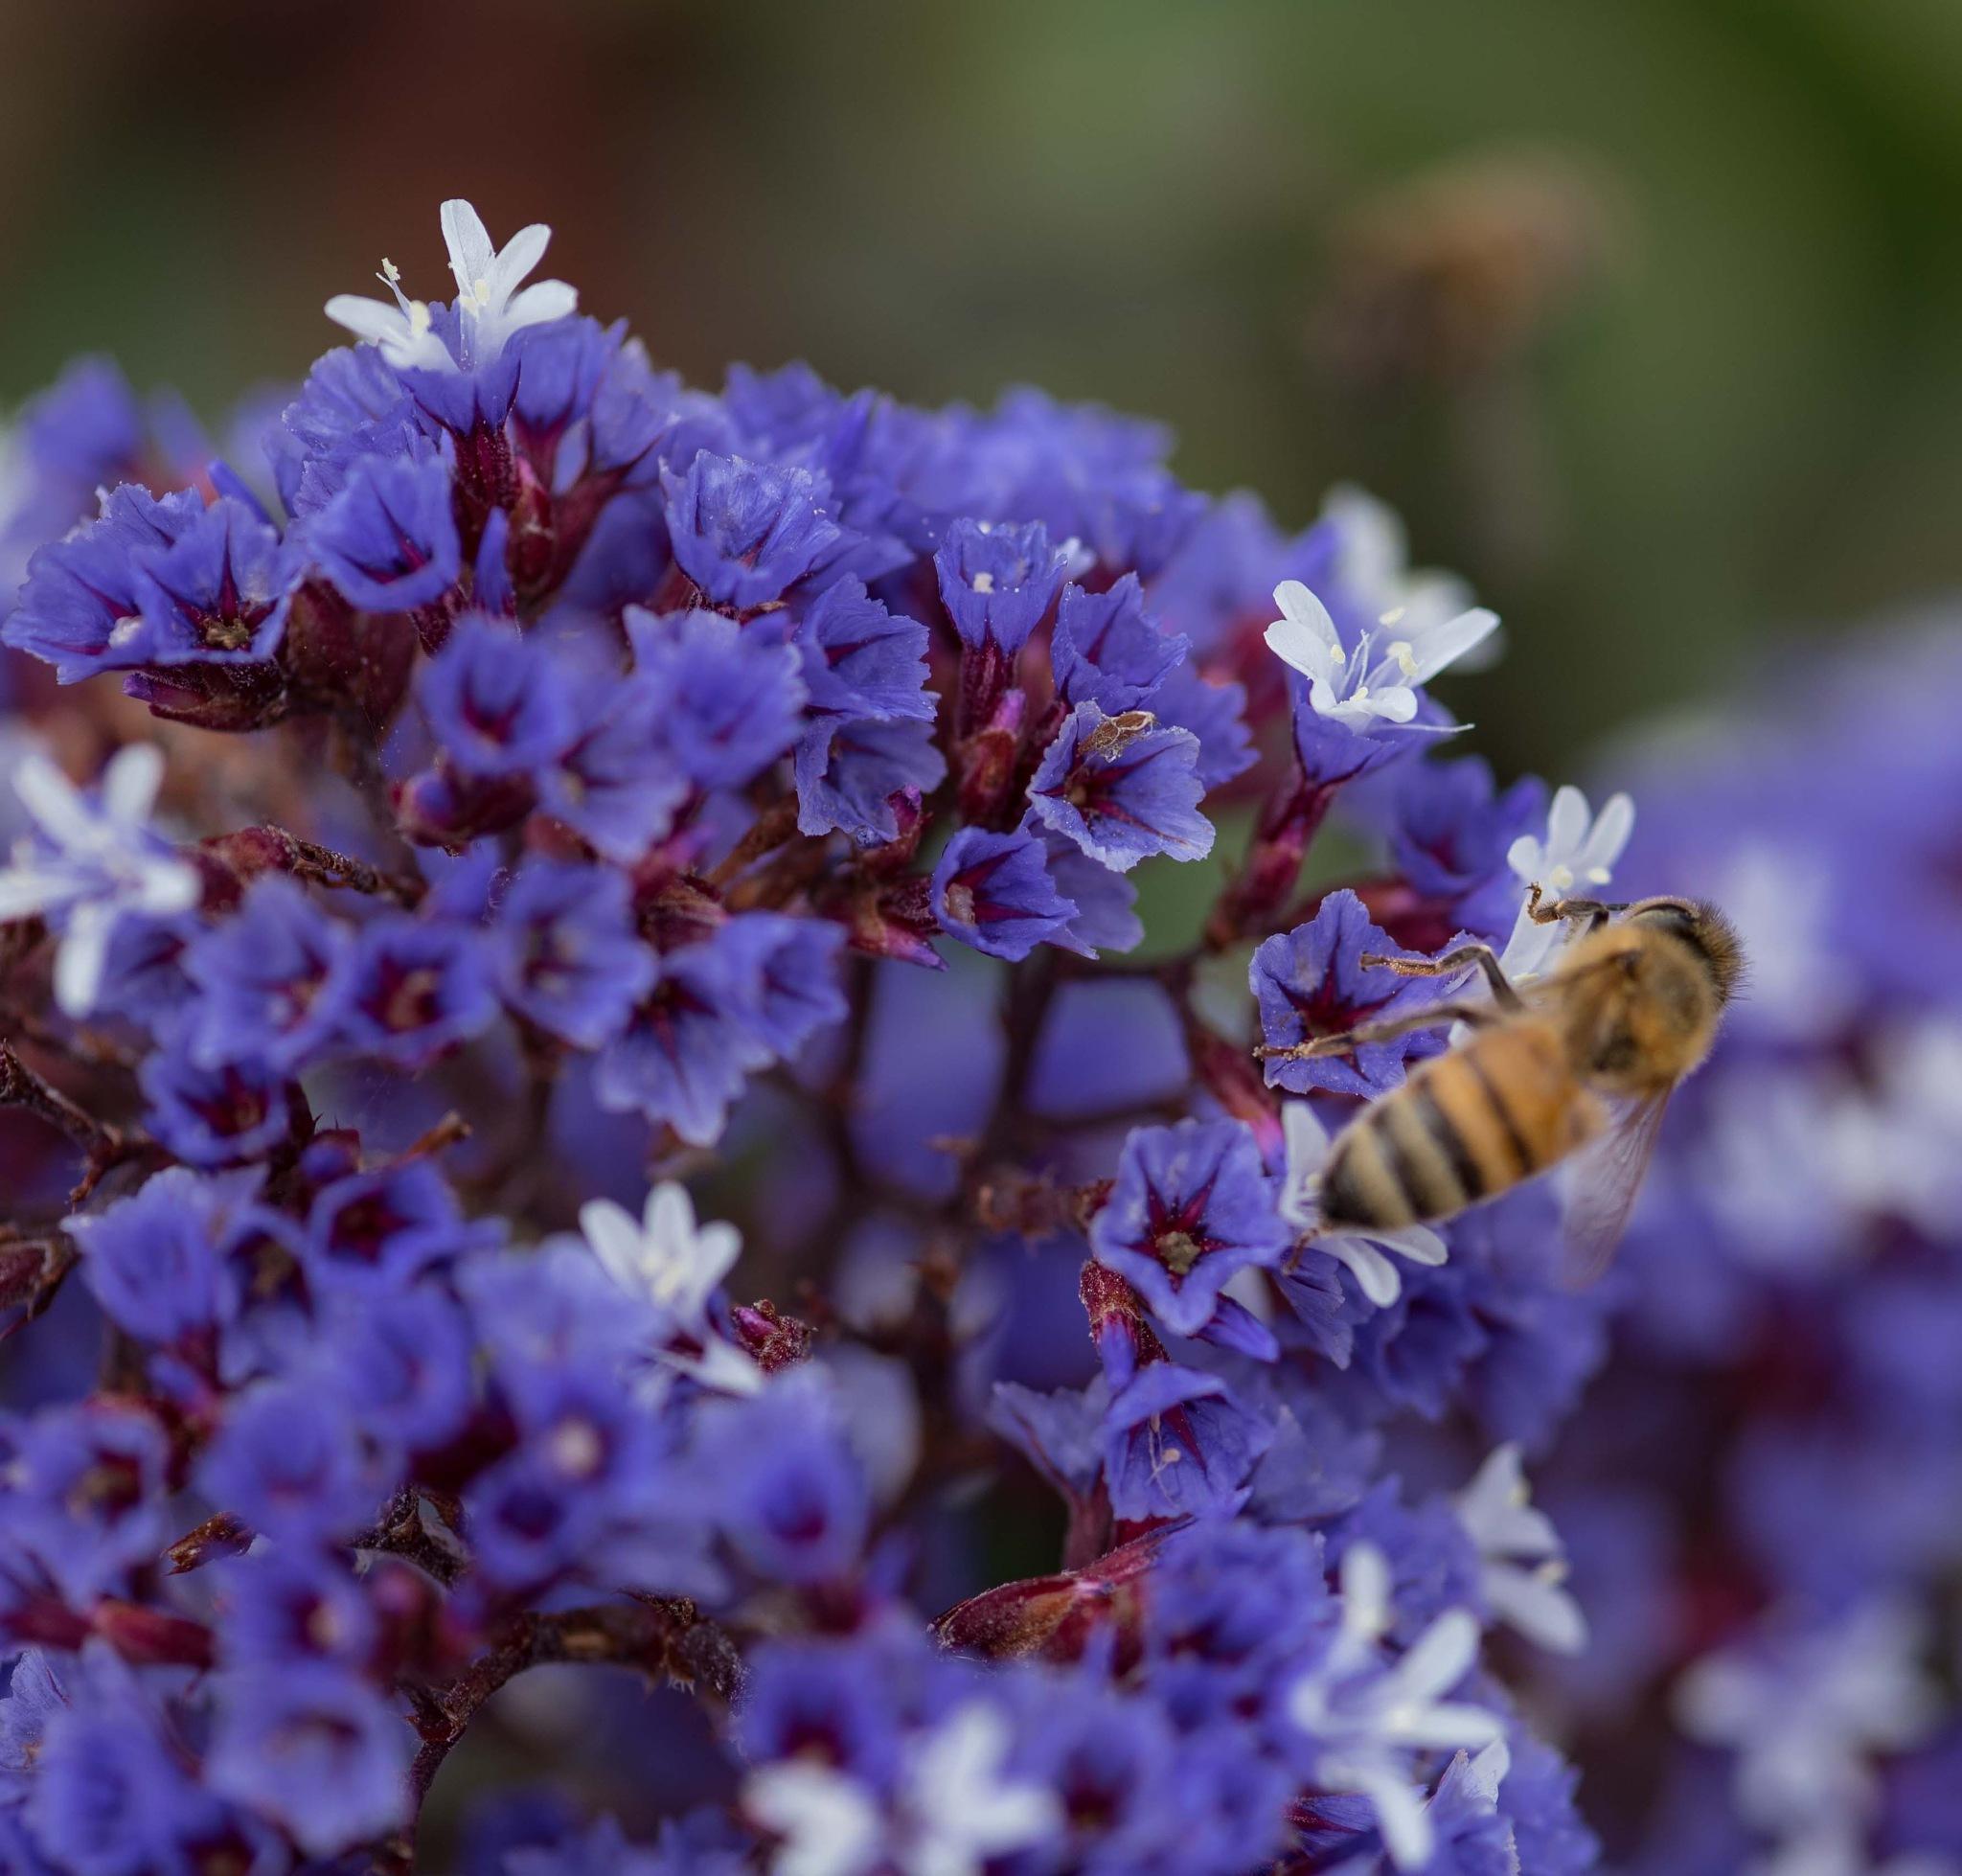 HONEY BEE by DrJohnHodgson